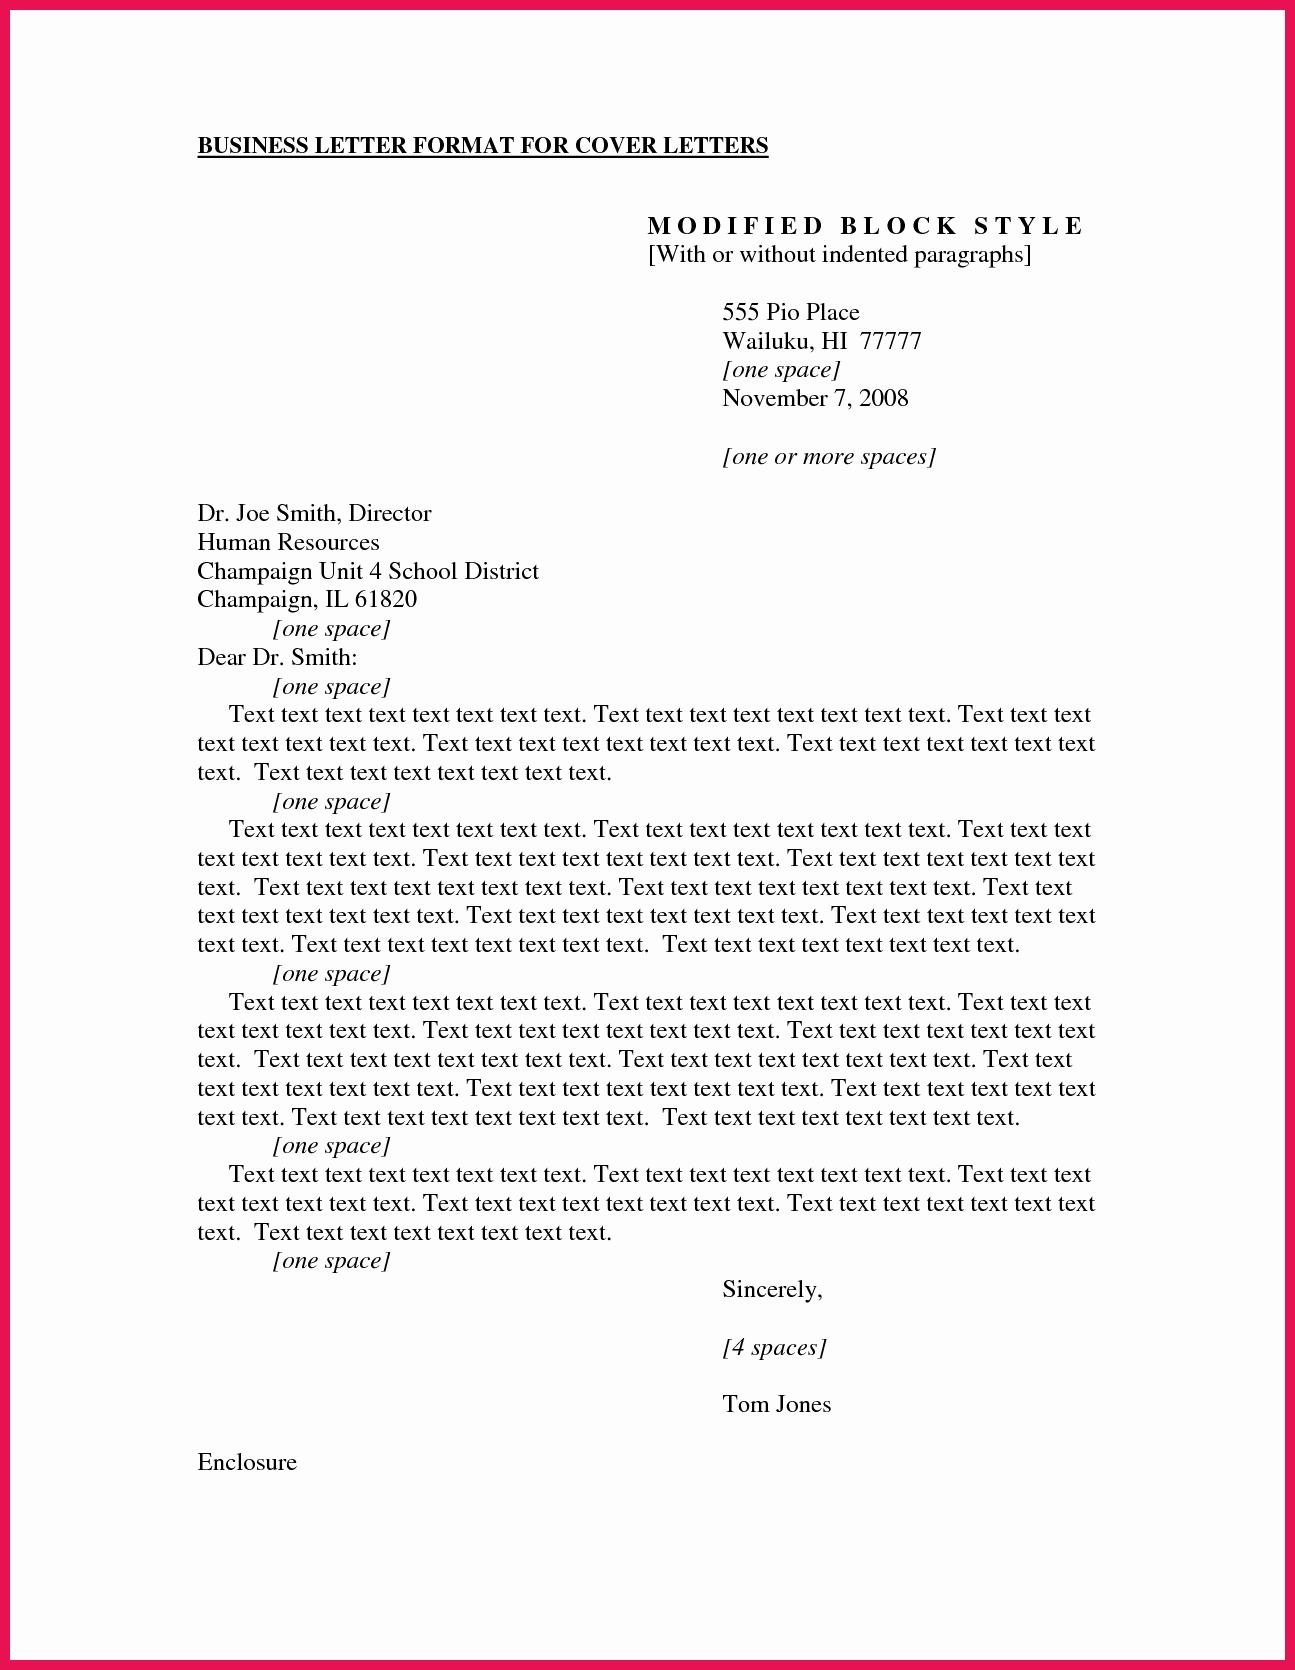 Business Letter format Purdue Owl Fresh Business Cover Letter format